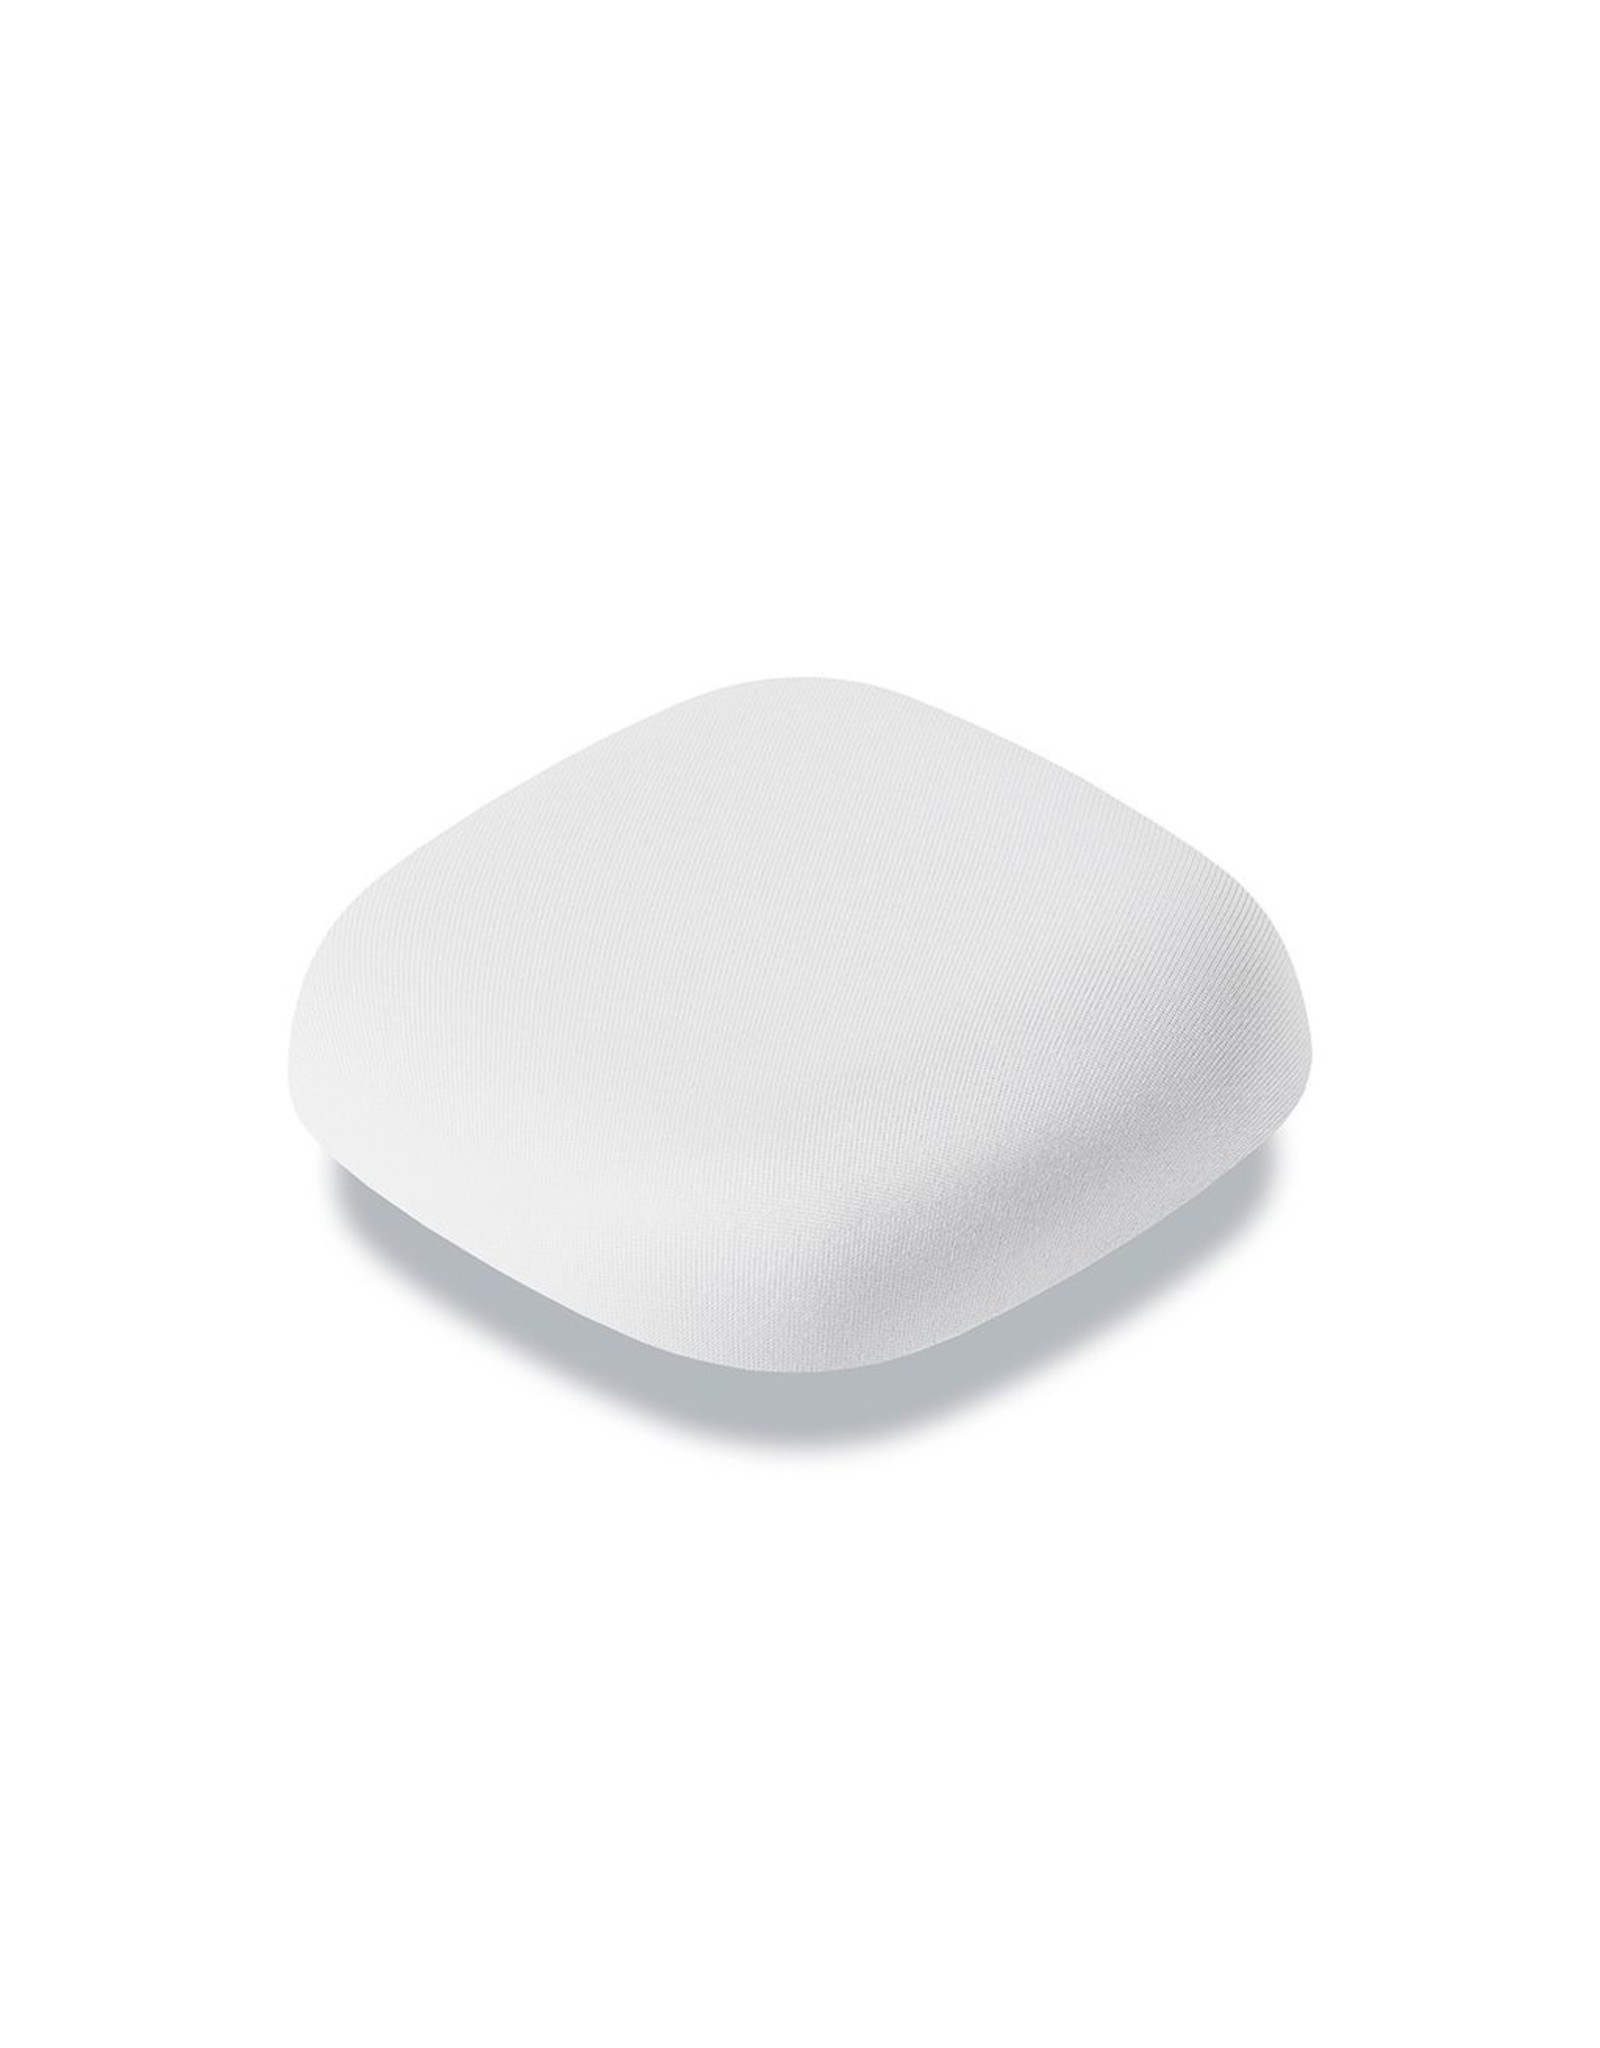 Gadgets KUPU 10 SMOKE ALARM FABRIC WHITE